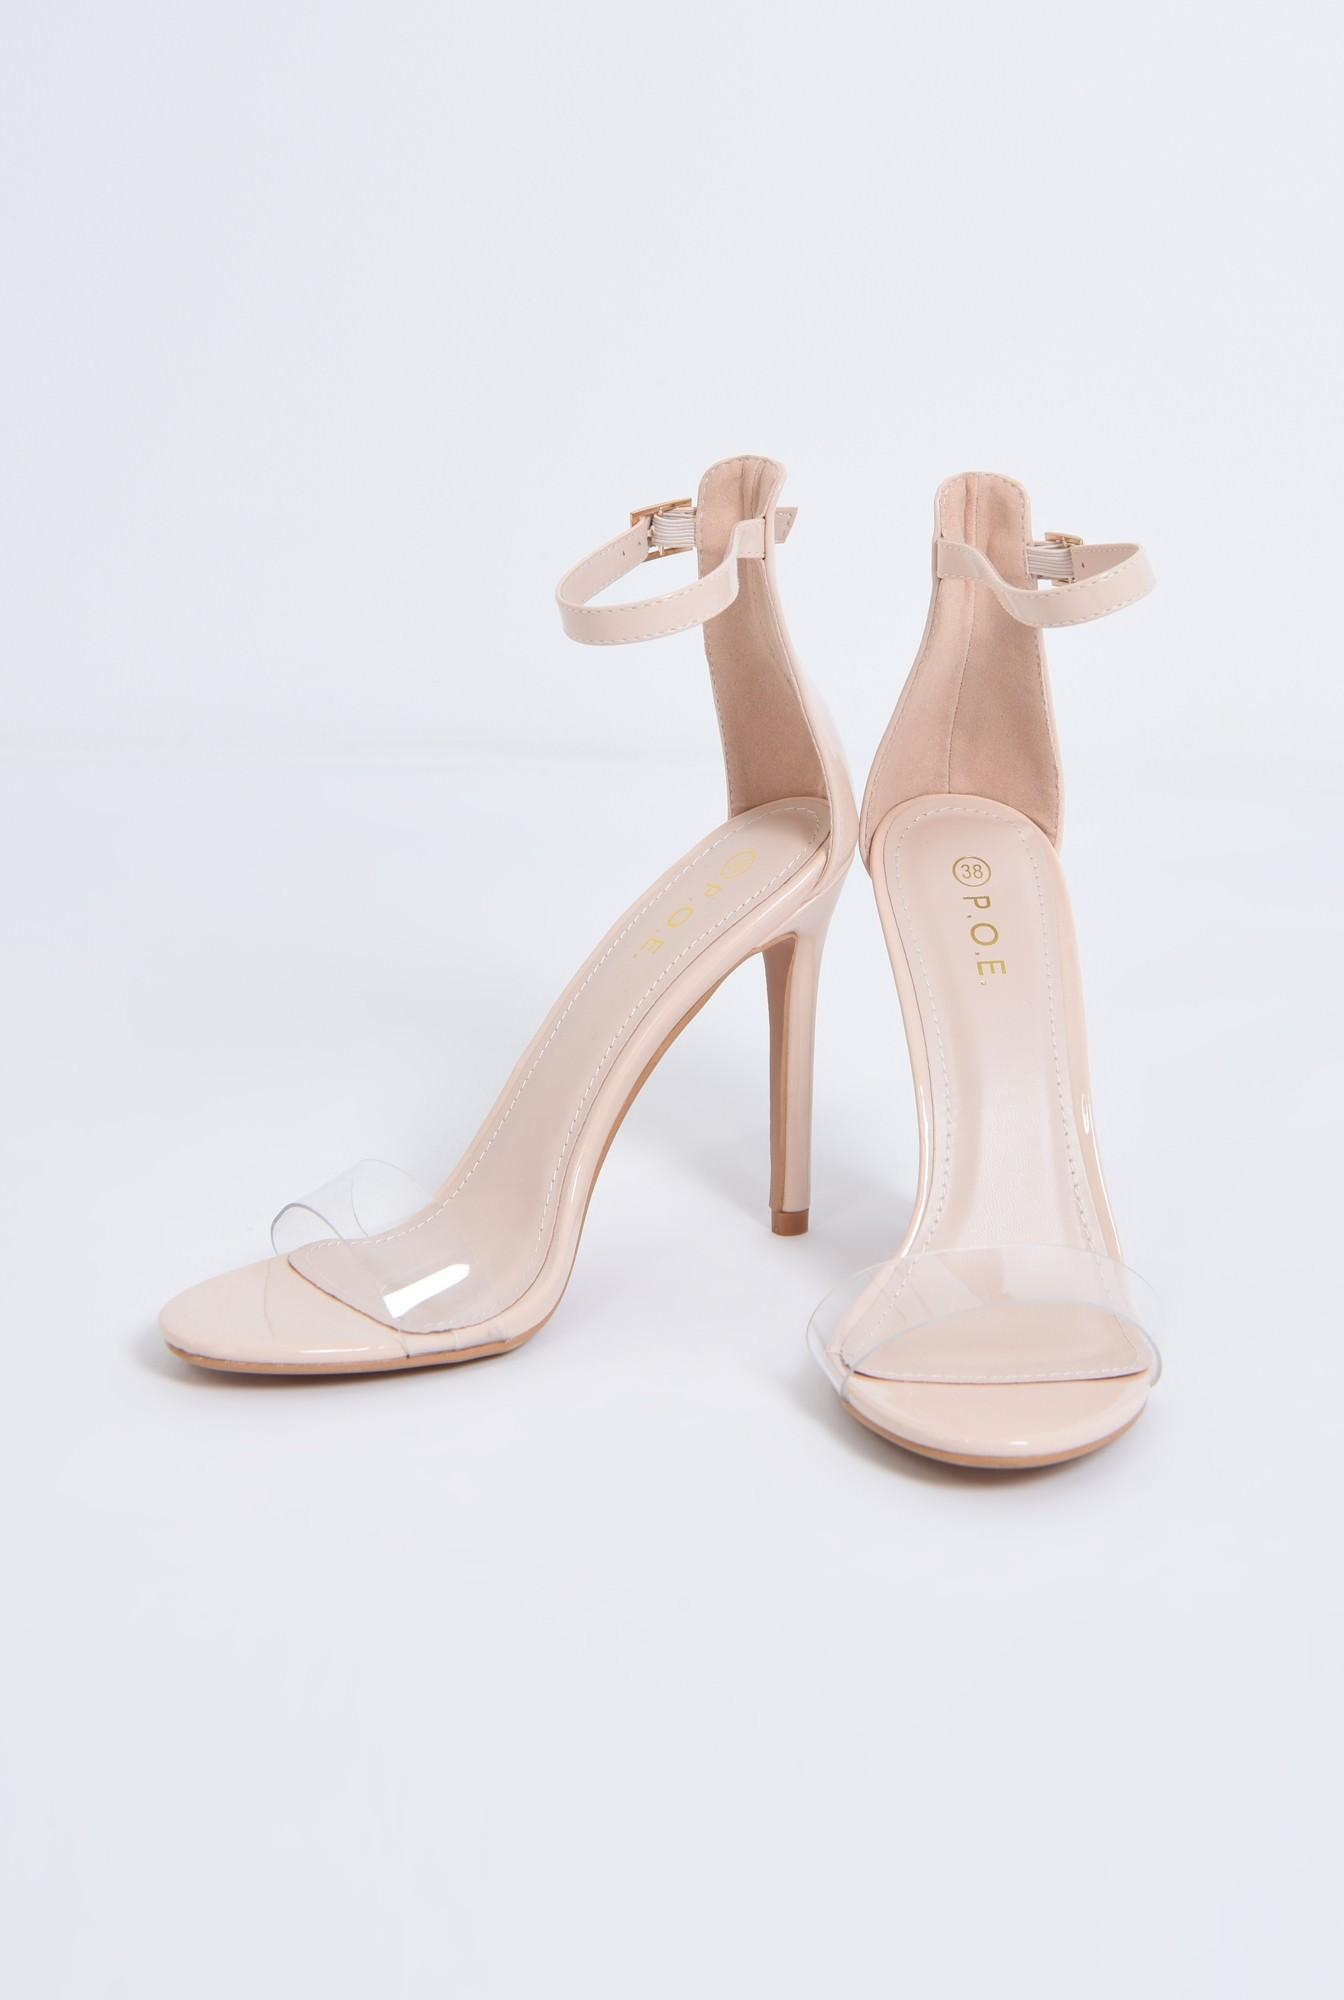 3 - sandale elegante, nude, lac, stiletto